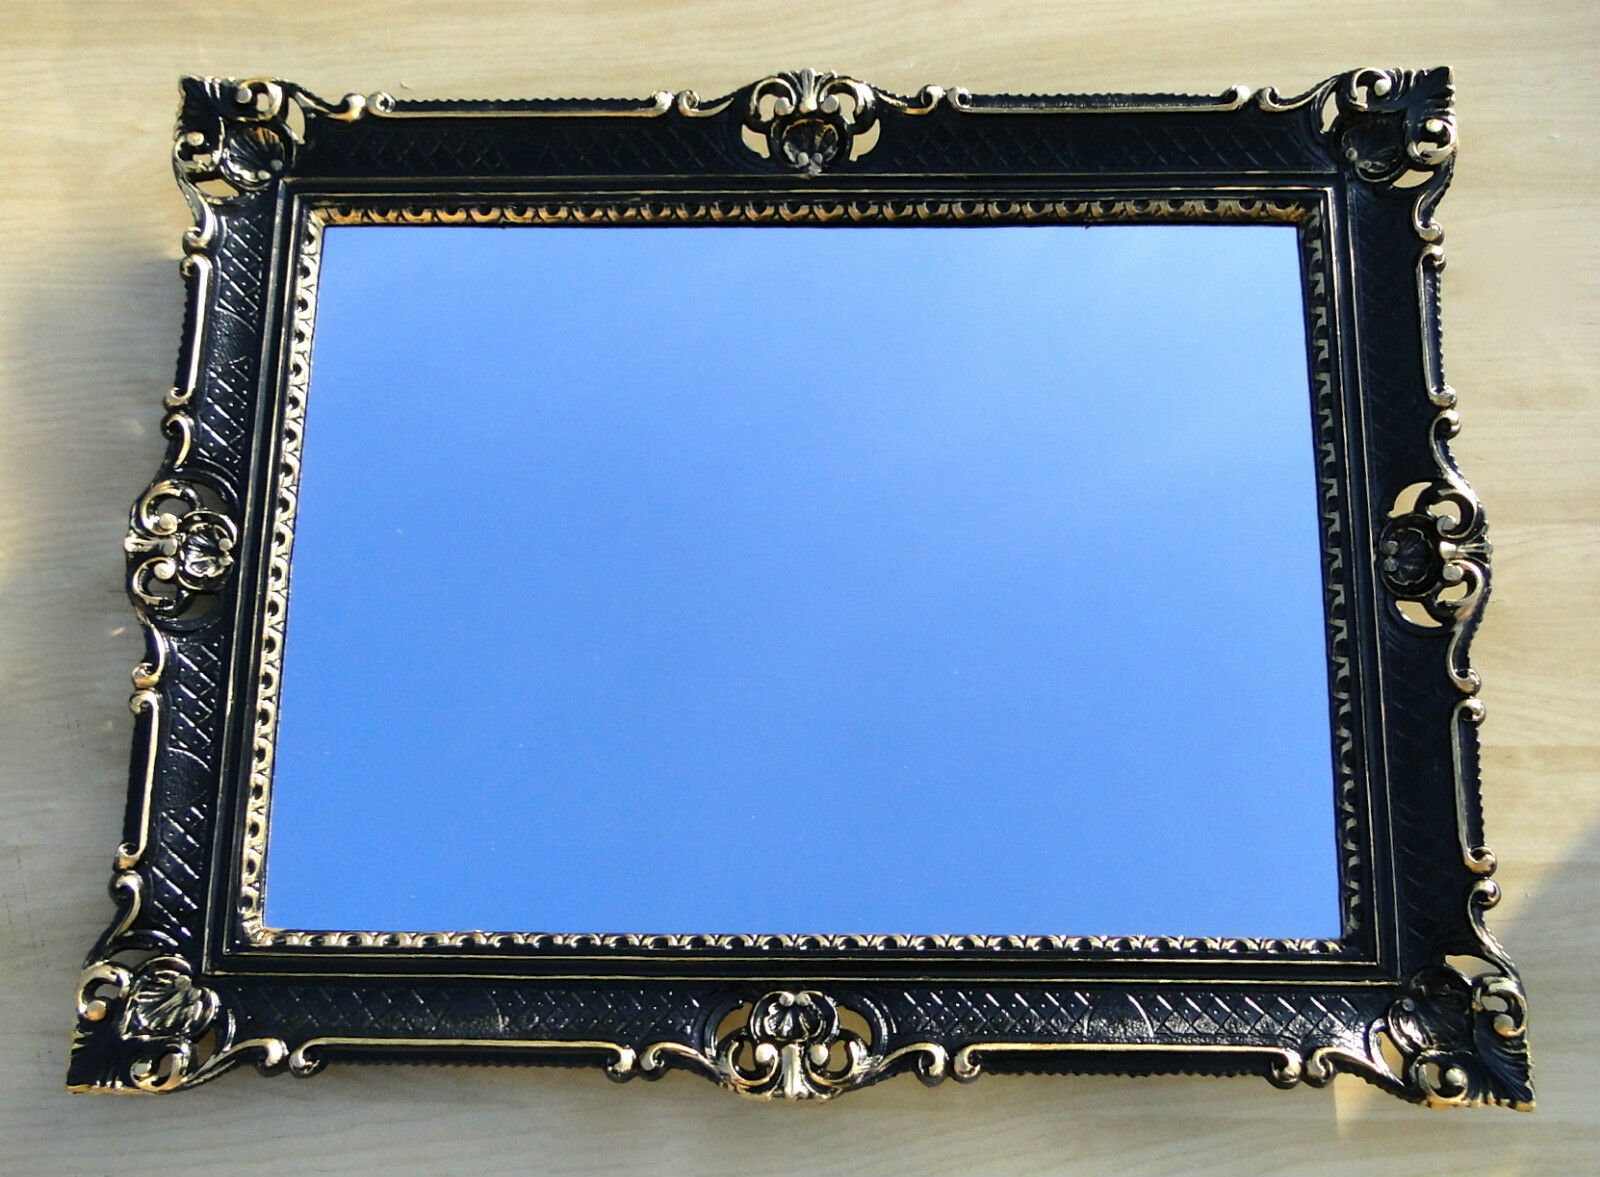 wandspiegel barock gro er spiegel schwarz gold hochglanz 90x70 bilderrahmen for sale eur. Black Bedroom Furniture Sets. Home Design Ideas